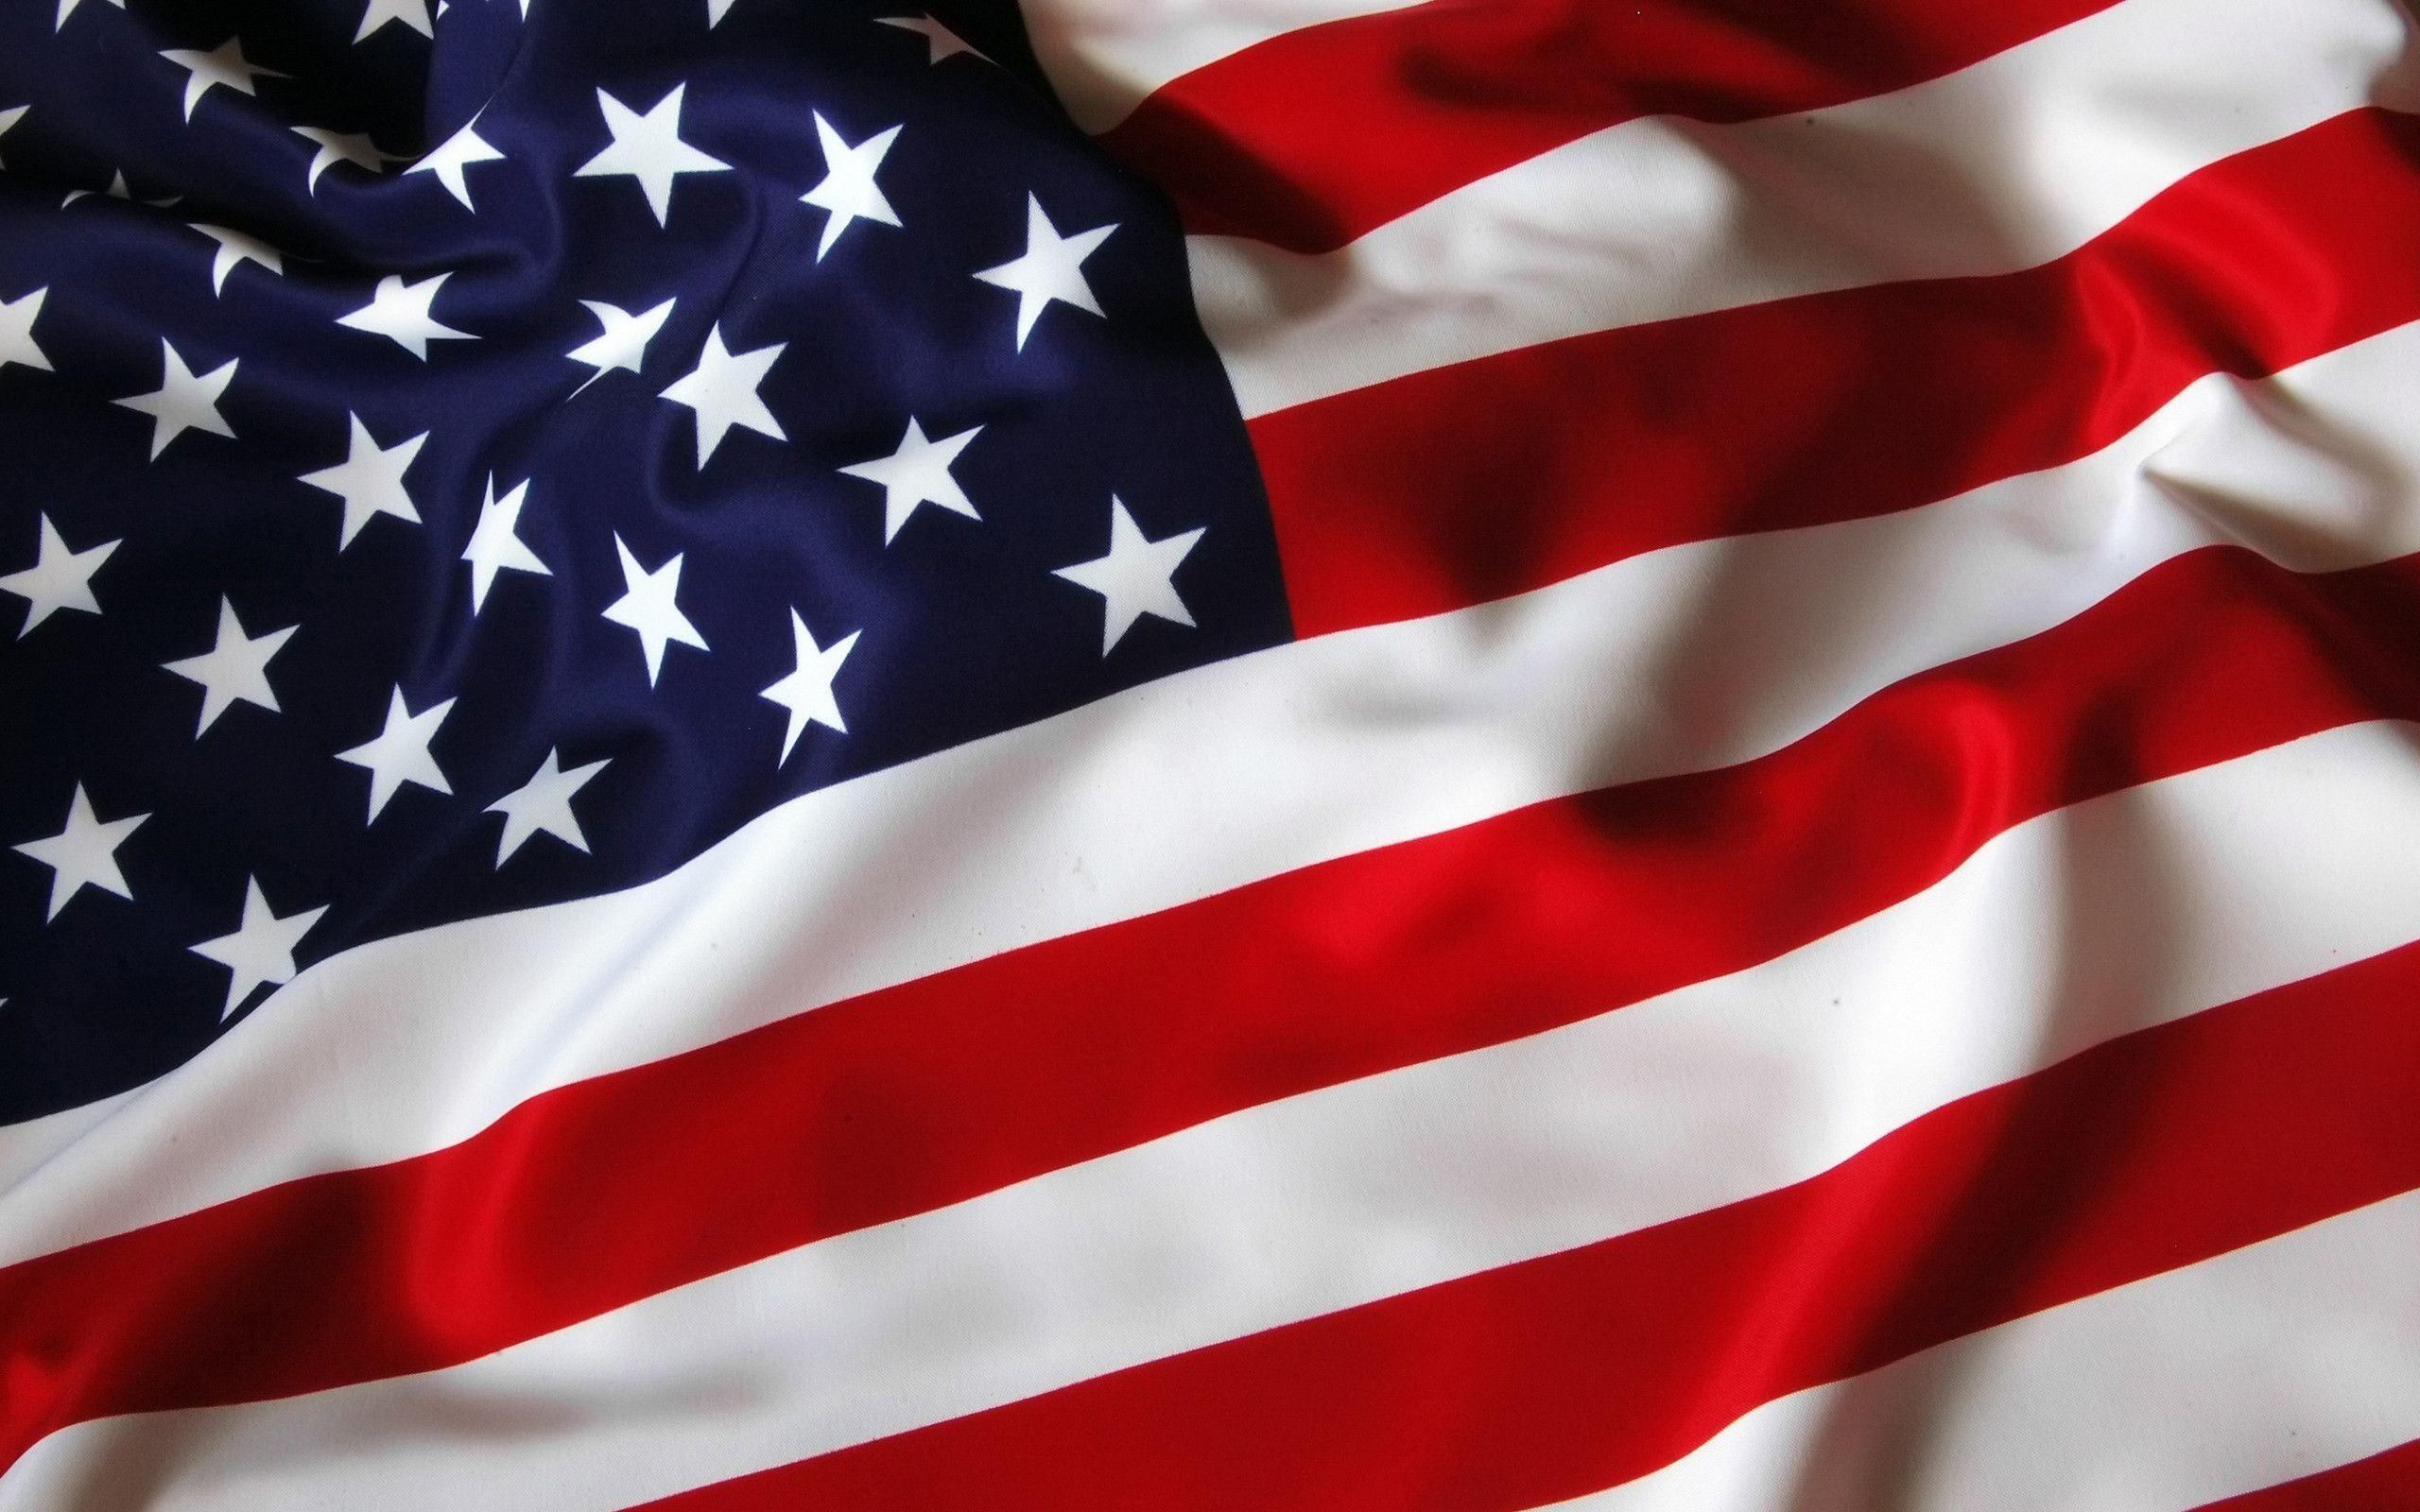 High Resolution Wallpaper American Flag